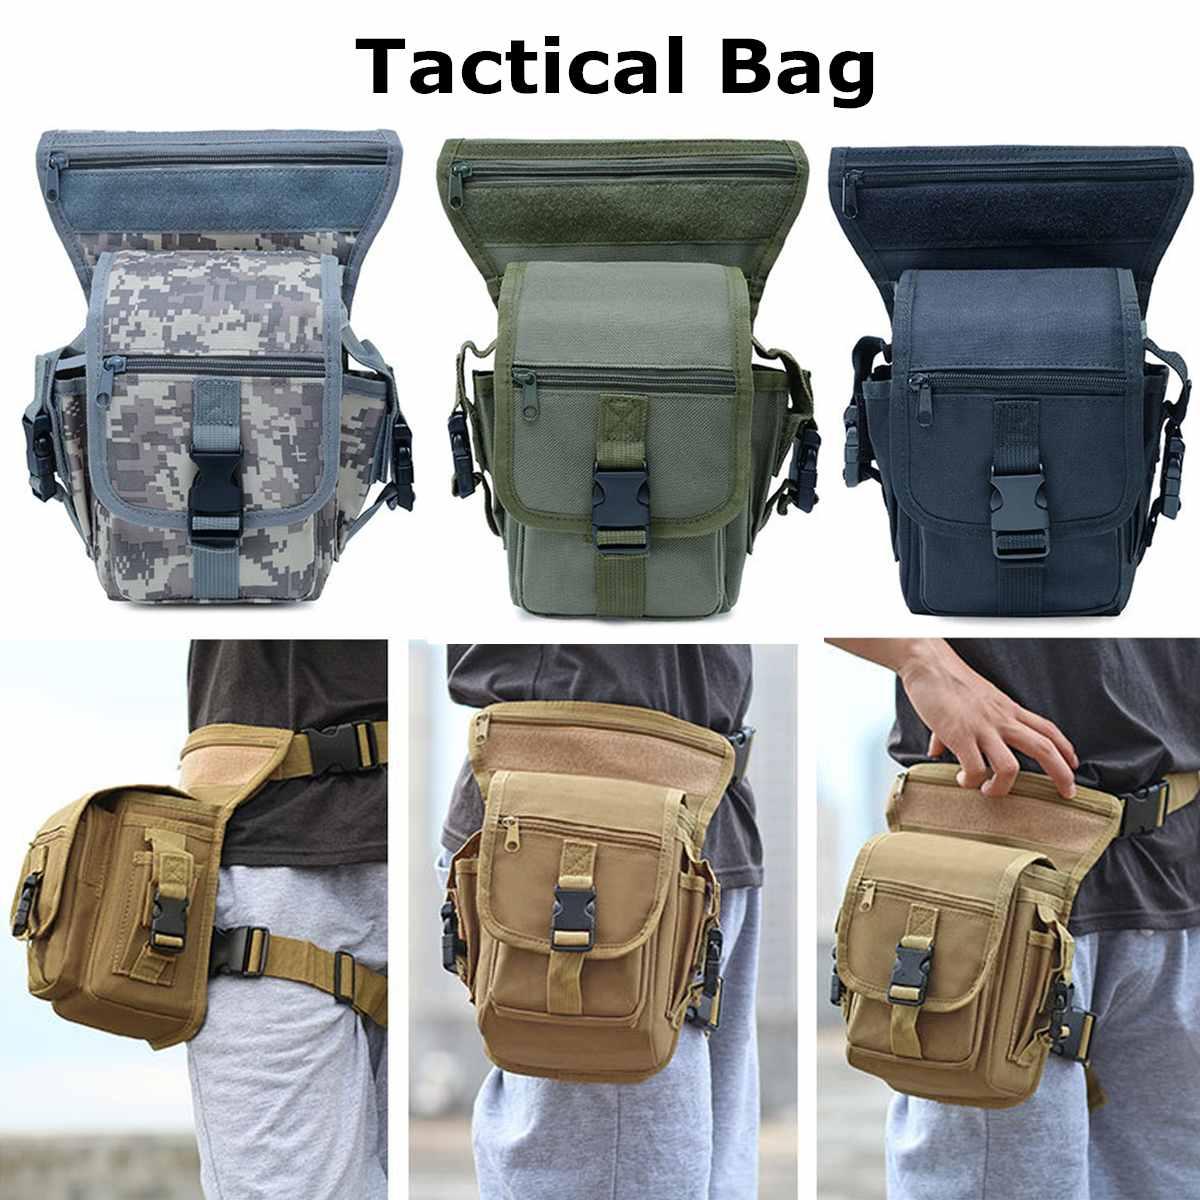 Men Military Tactics Leg Bag Fanny Pack Oxford Waterproof Waist Pack Bum Bag Multi-Purpose Hip Belt Pouch Camouflage